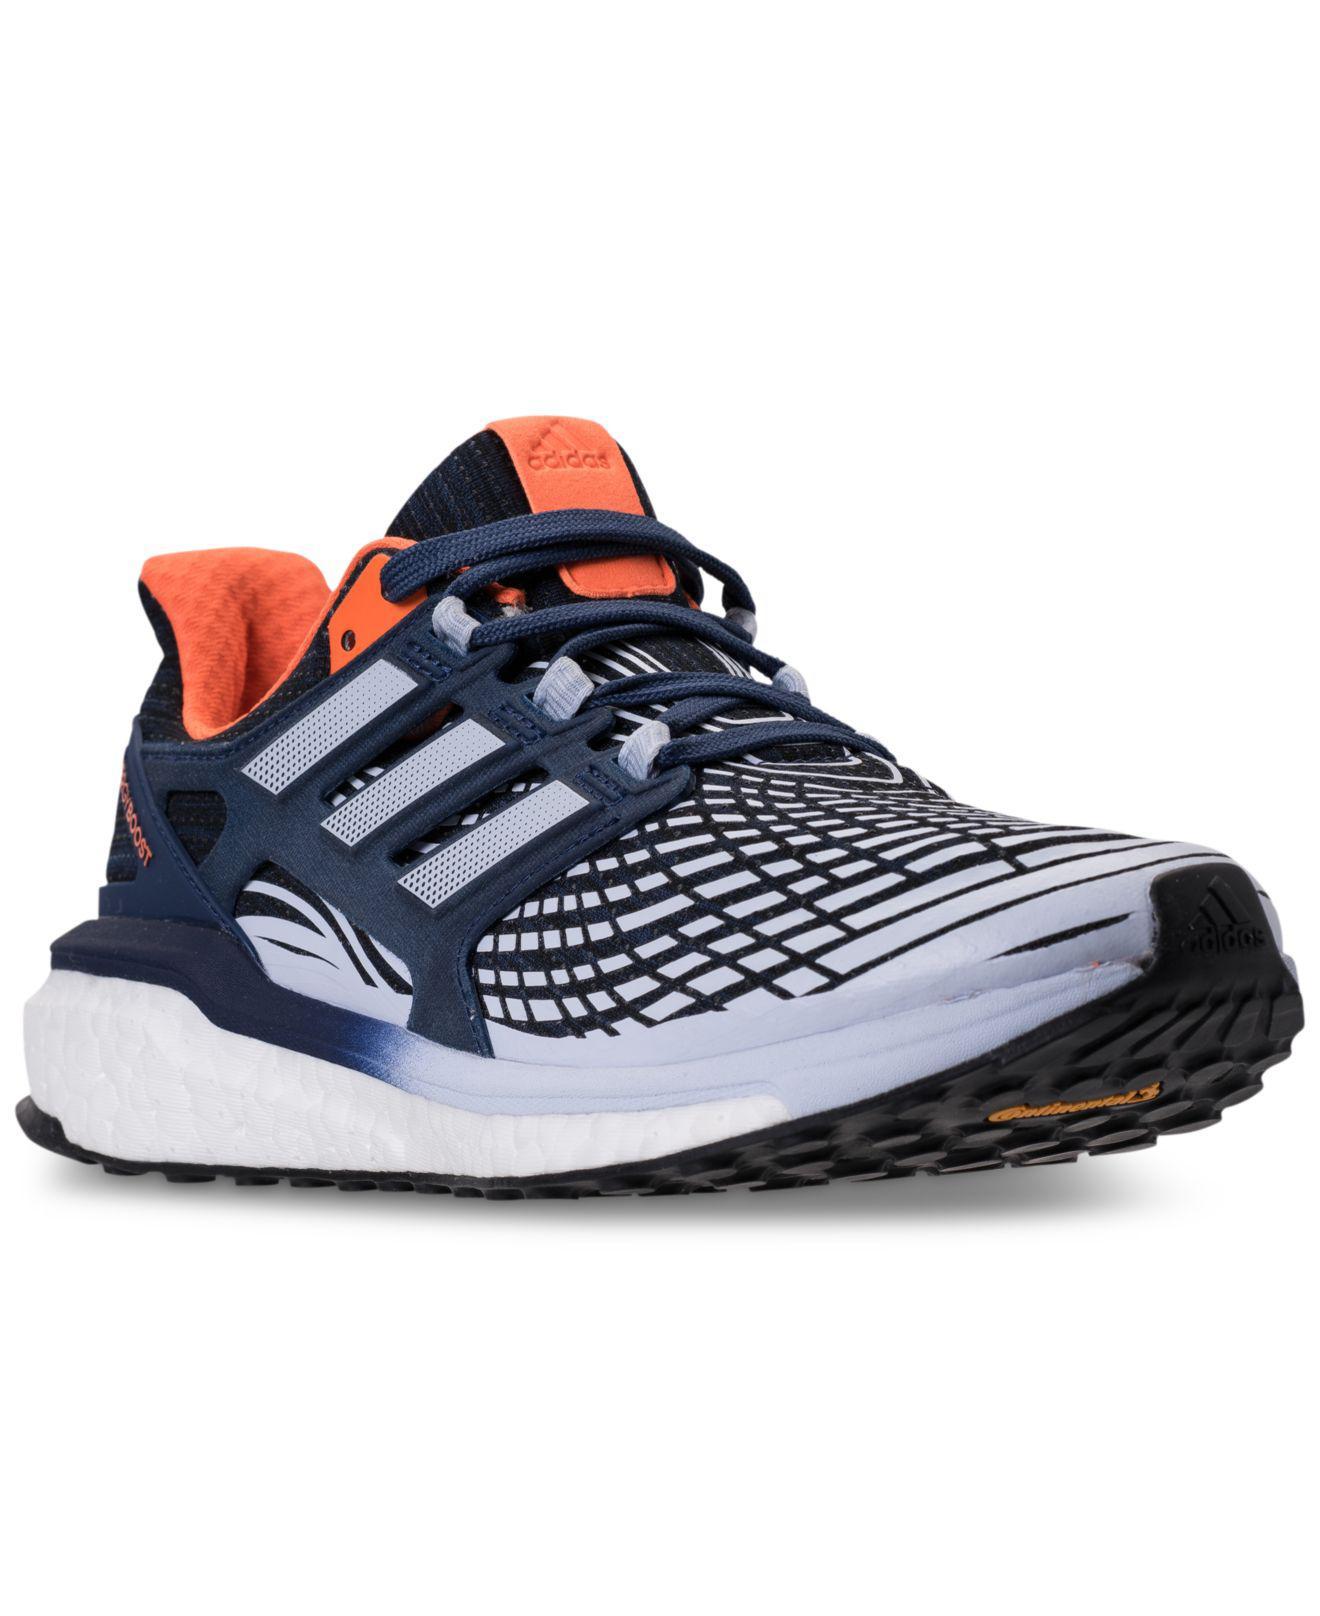 lyst adidas energia impulso in scarpe da ginnastica dal traguardo in